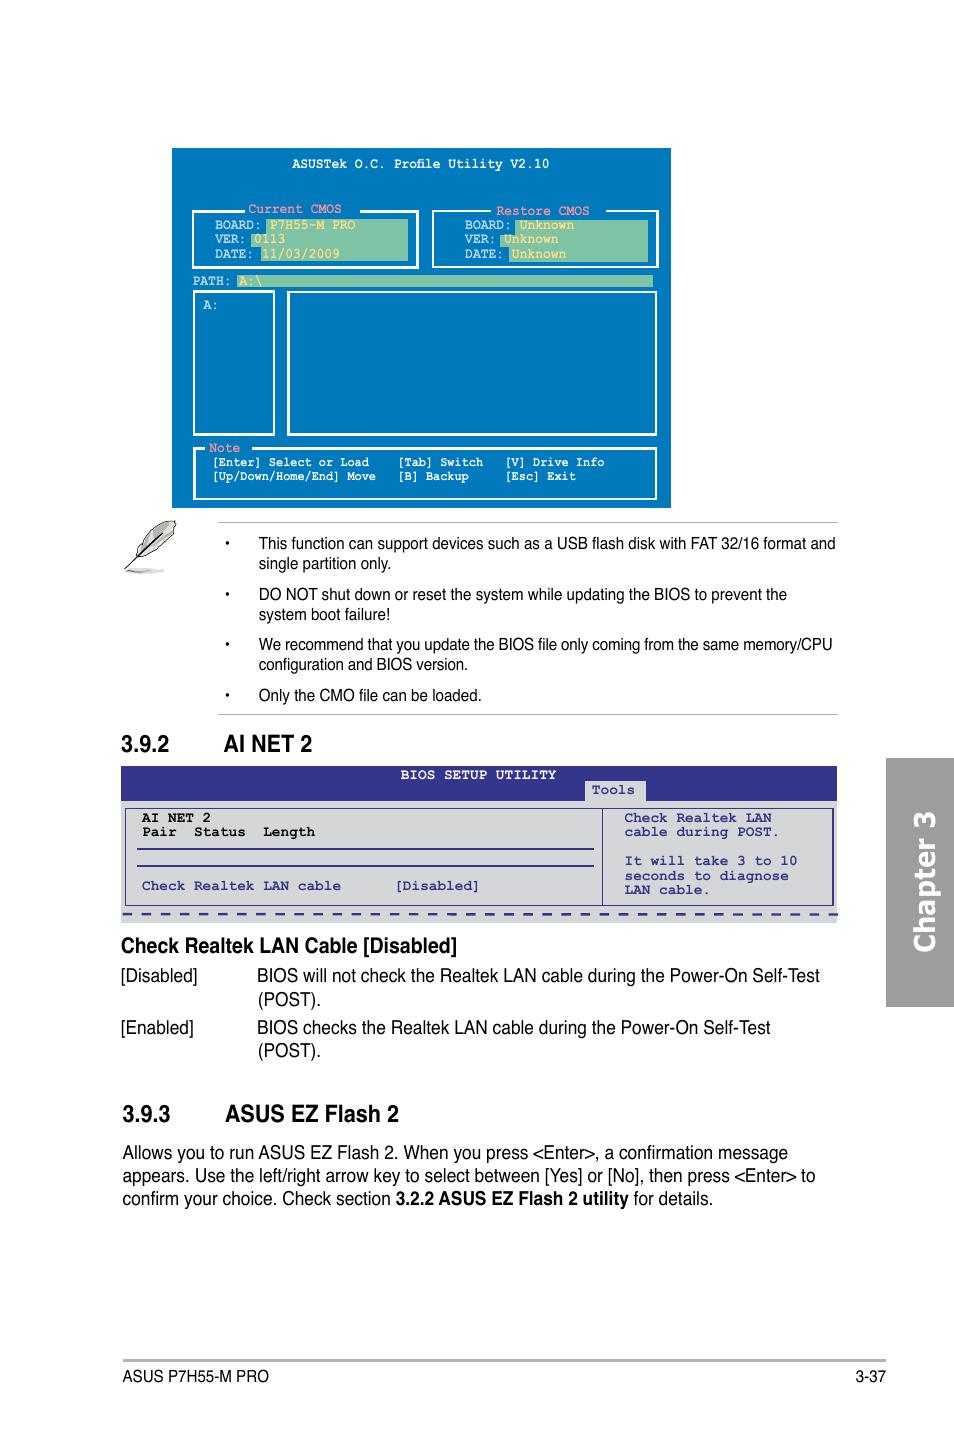 2 ai net 2 3 asus ez flash 2 ai net 2 37 asus p7h55 m pro user rh manualsdir com